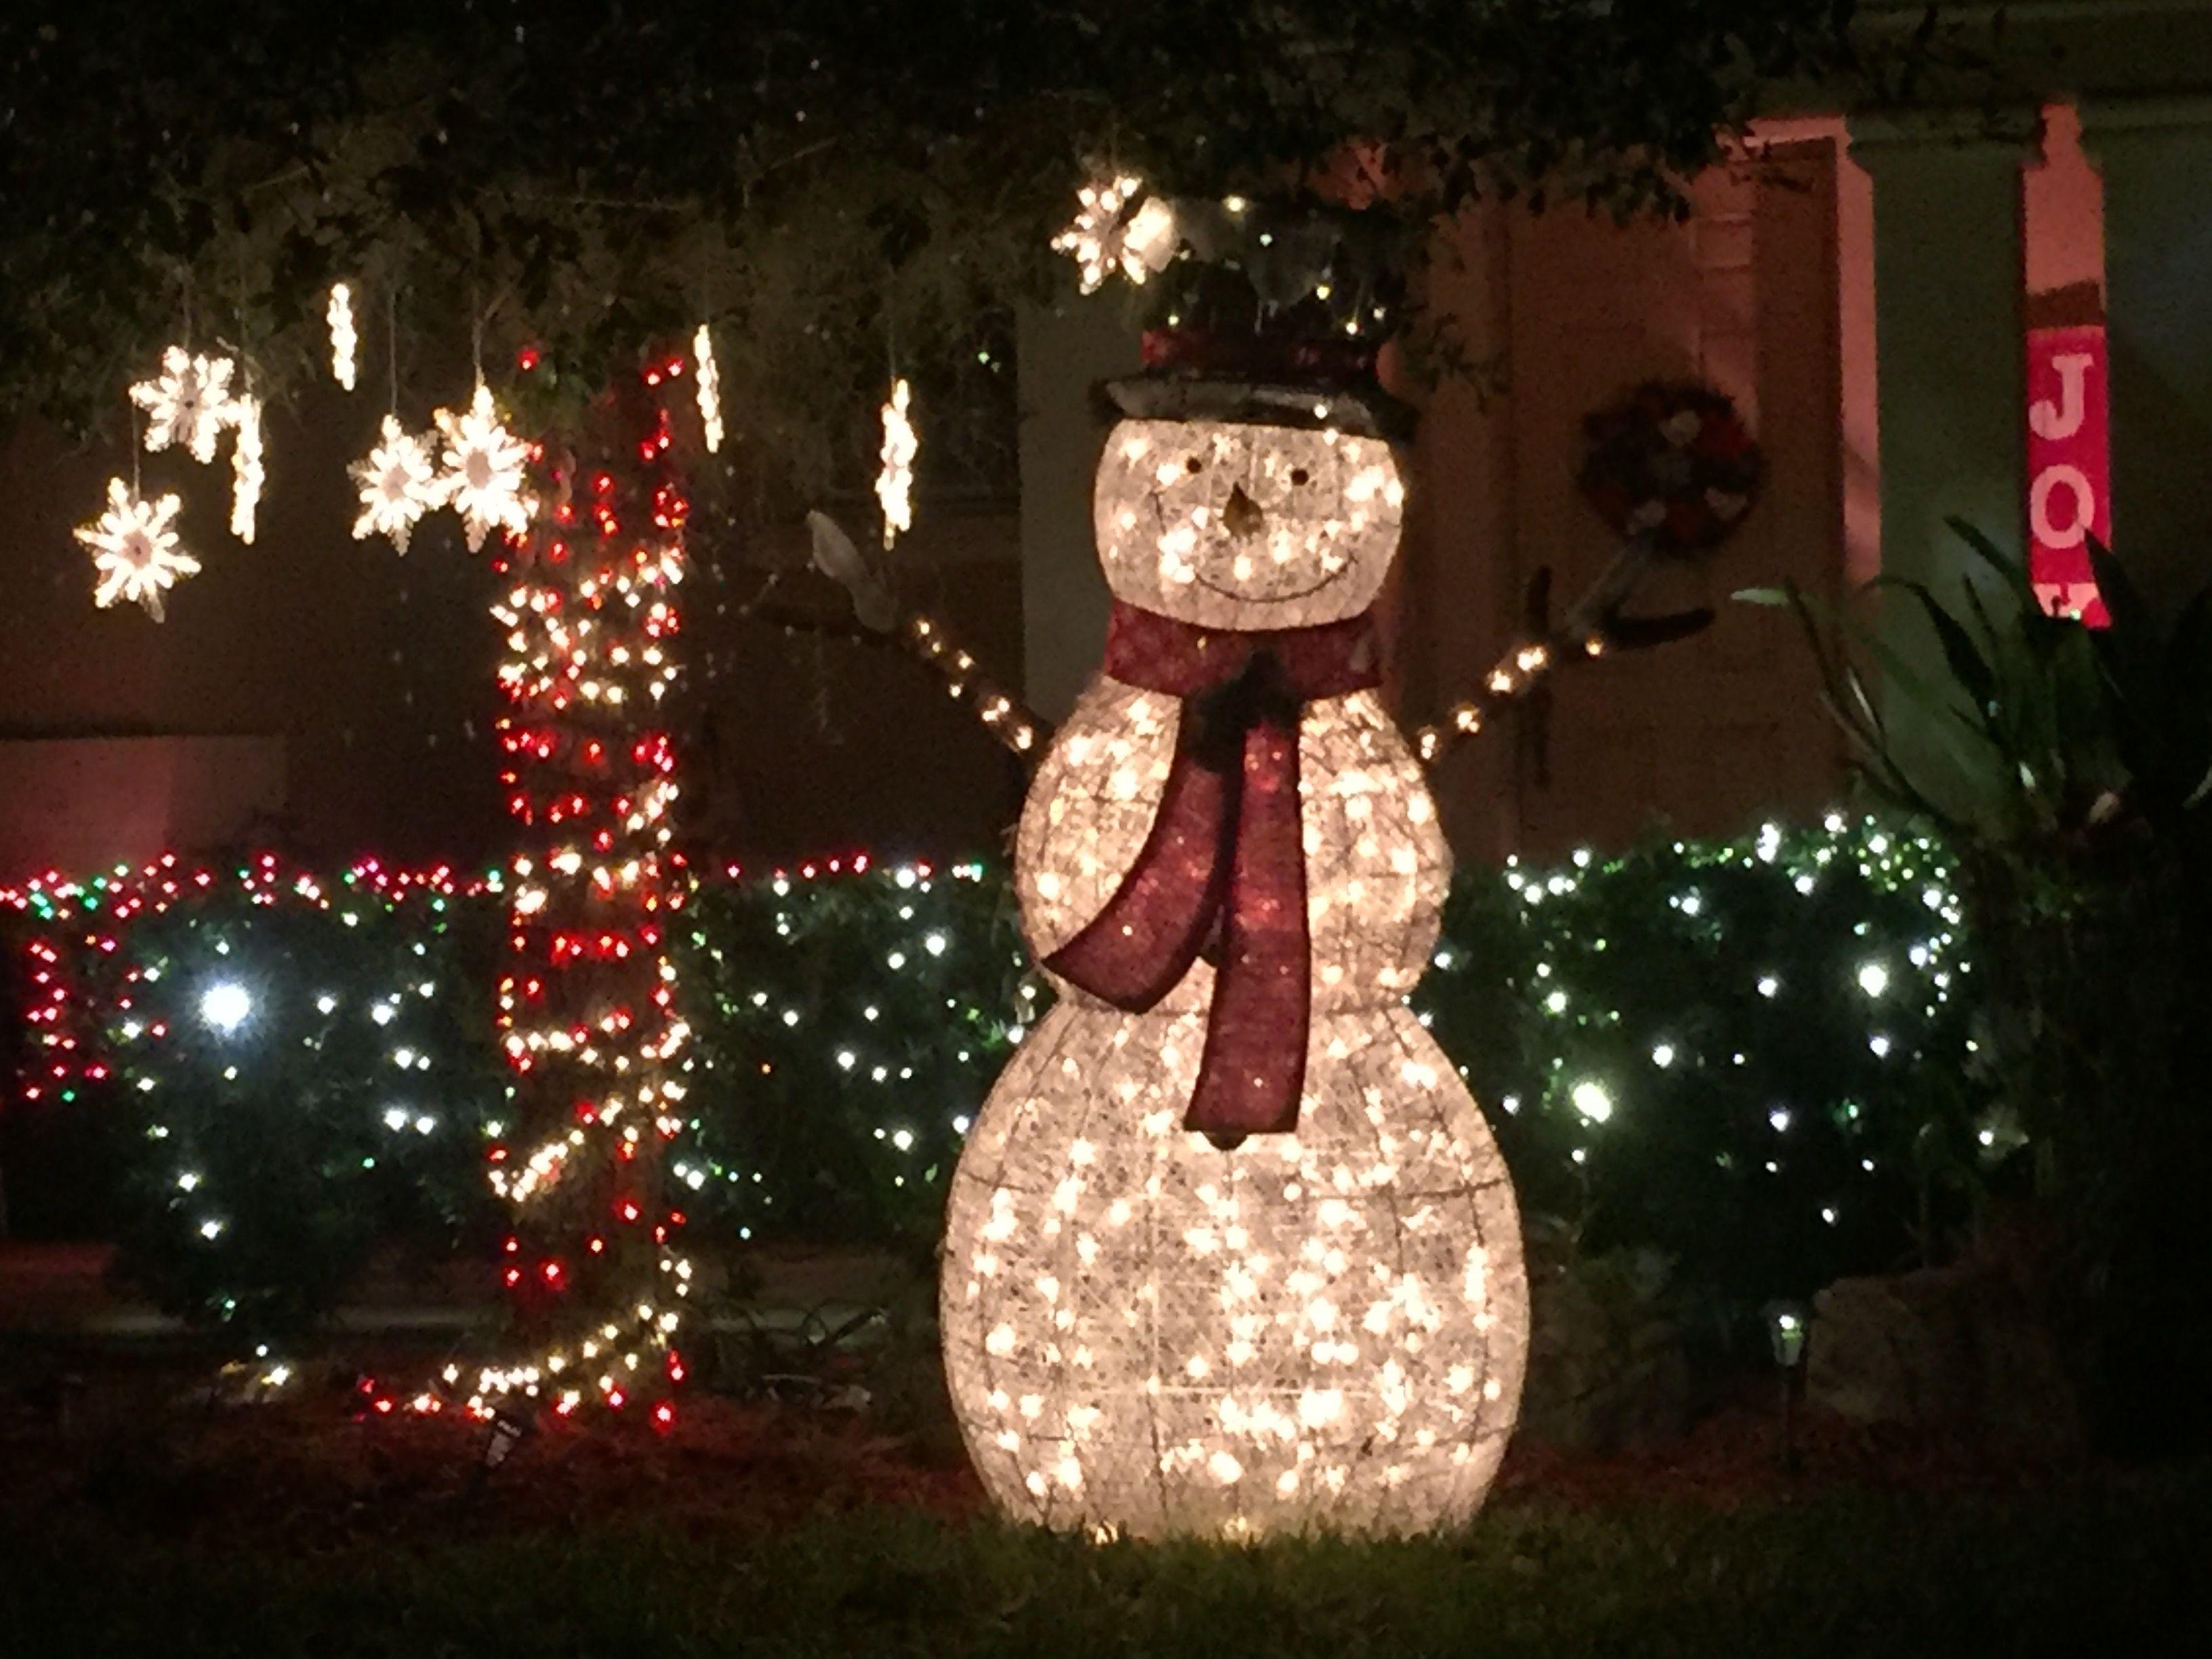 favorite homedepot christmas decoration black friday snowman - Black Friday Christmas Decorations